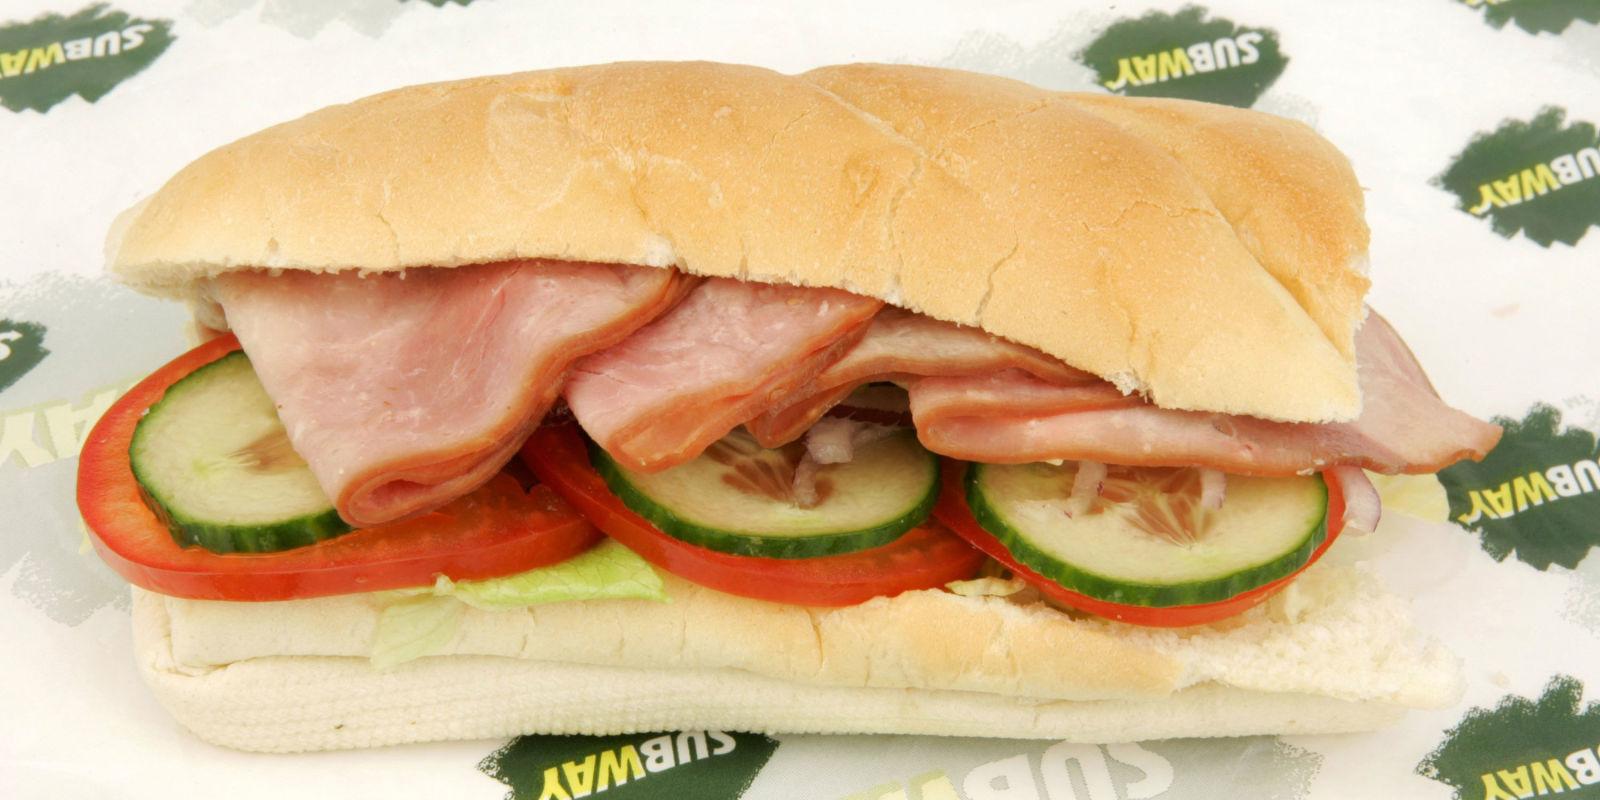 Glomorous Day Australia Subway Sub Legendary Subway Worker Reveals How To Get Free Sub Sandwiches Subway Sub Day Adelaide nice food Subways Sub Of The Day